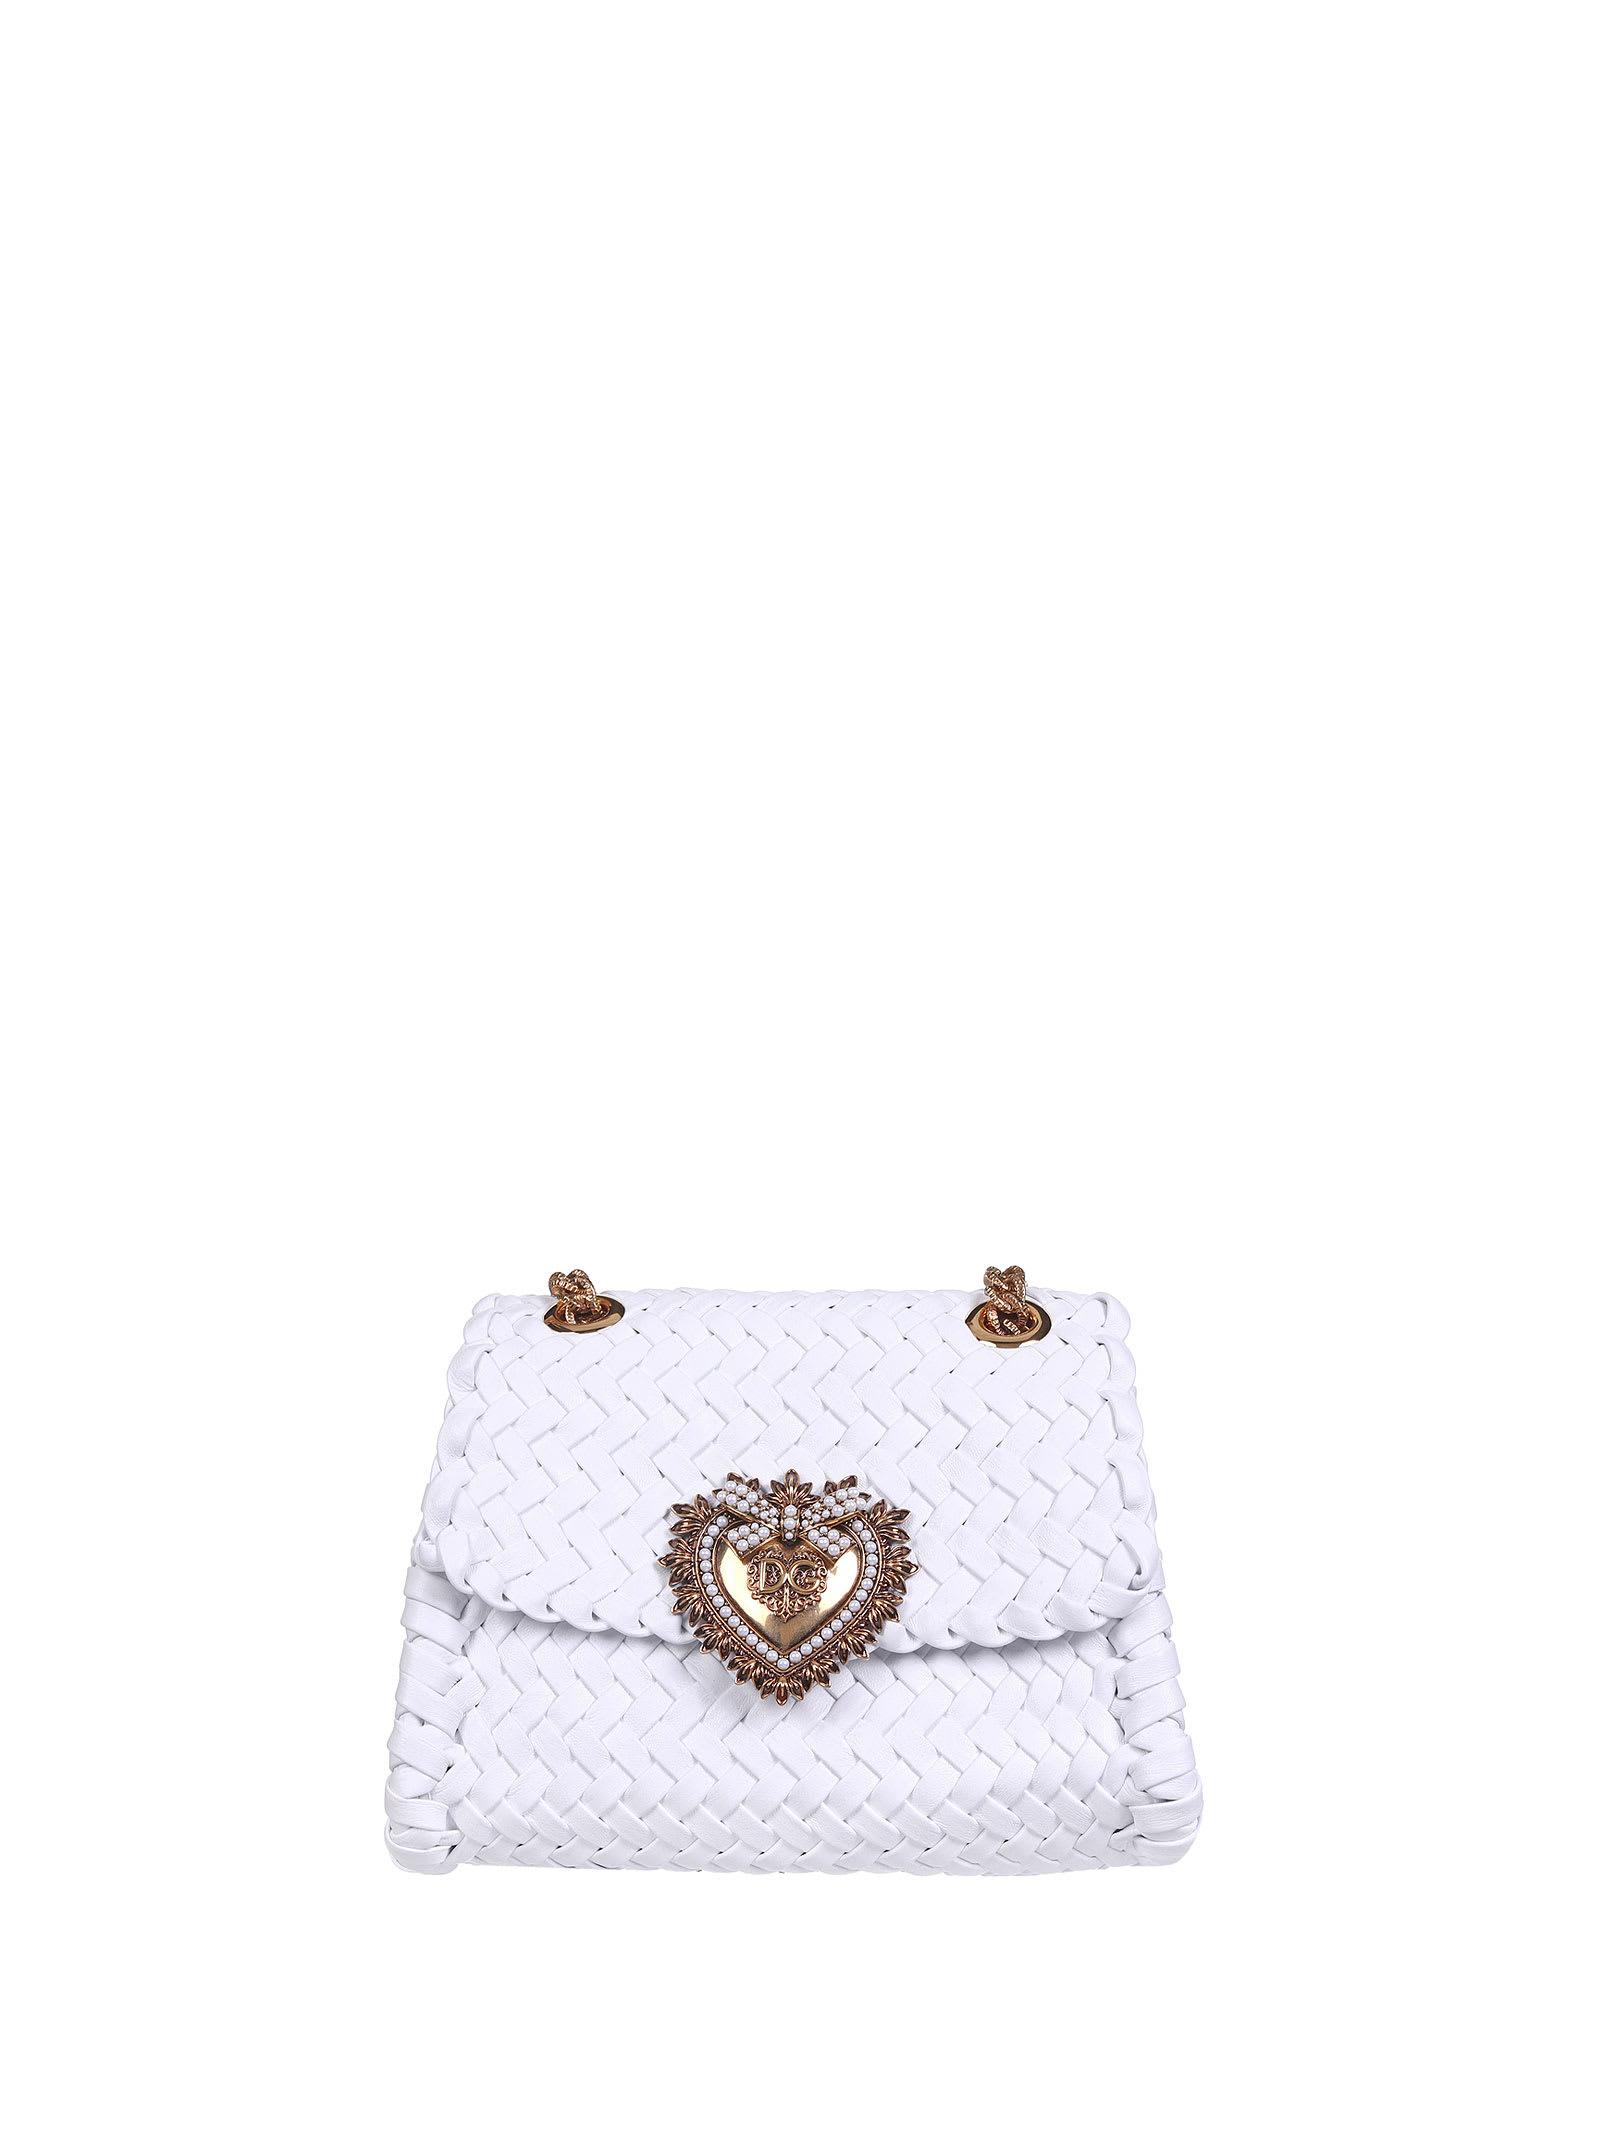 Dolce & Gabbana Devotion Woven Leather Crossbody Bag In White